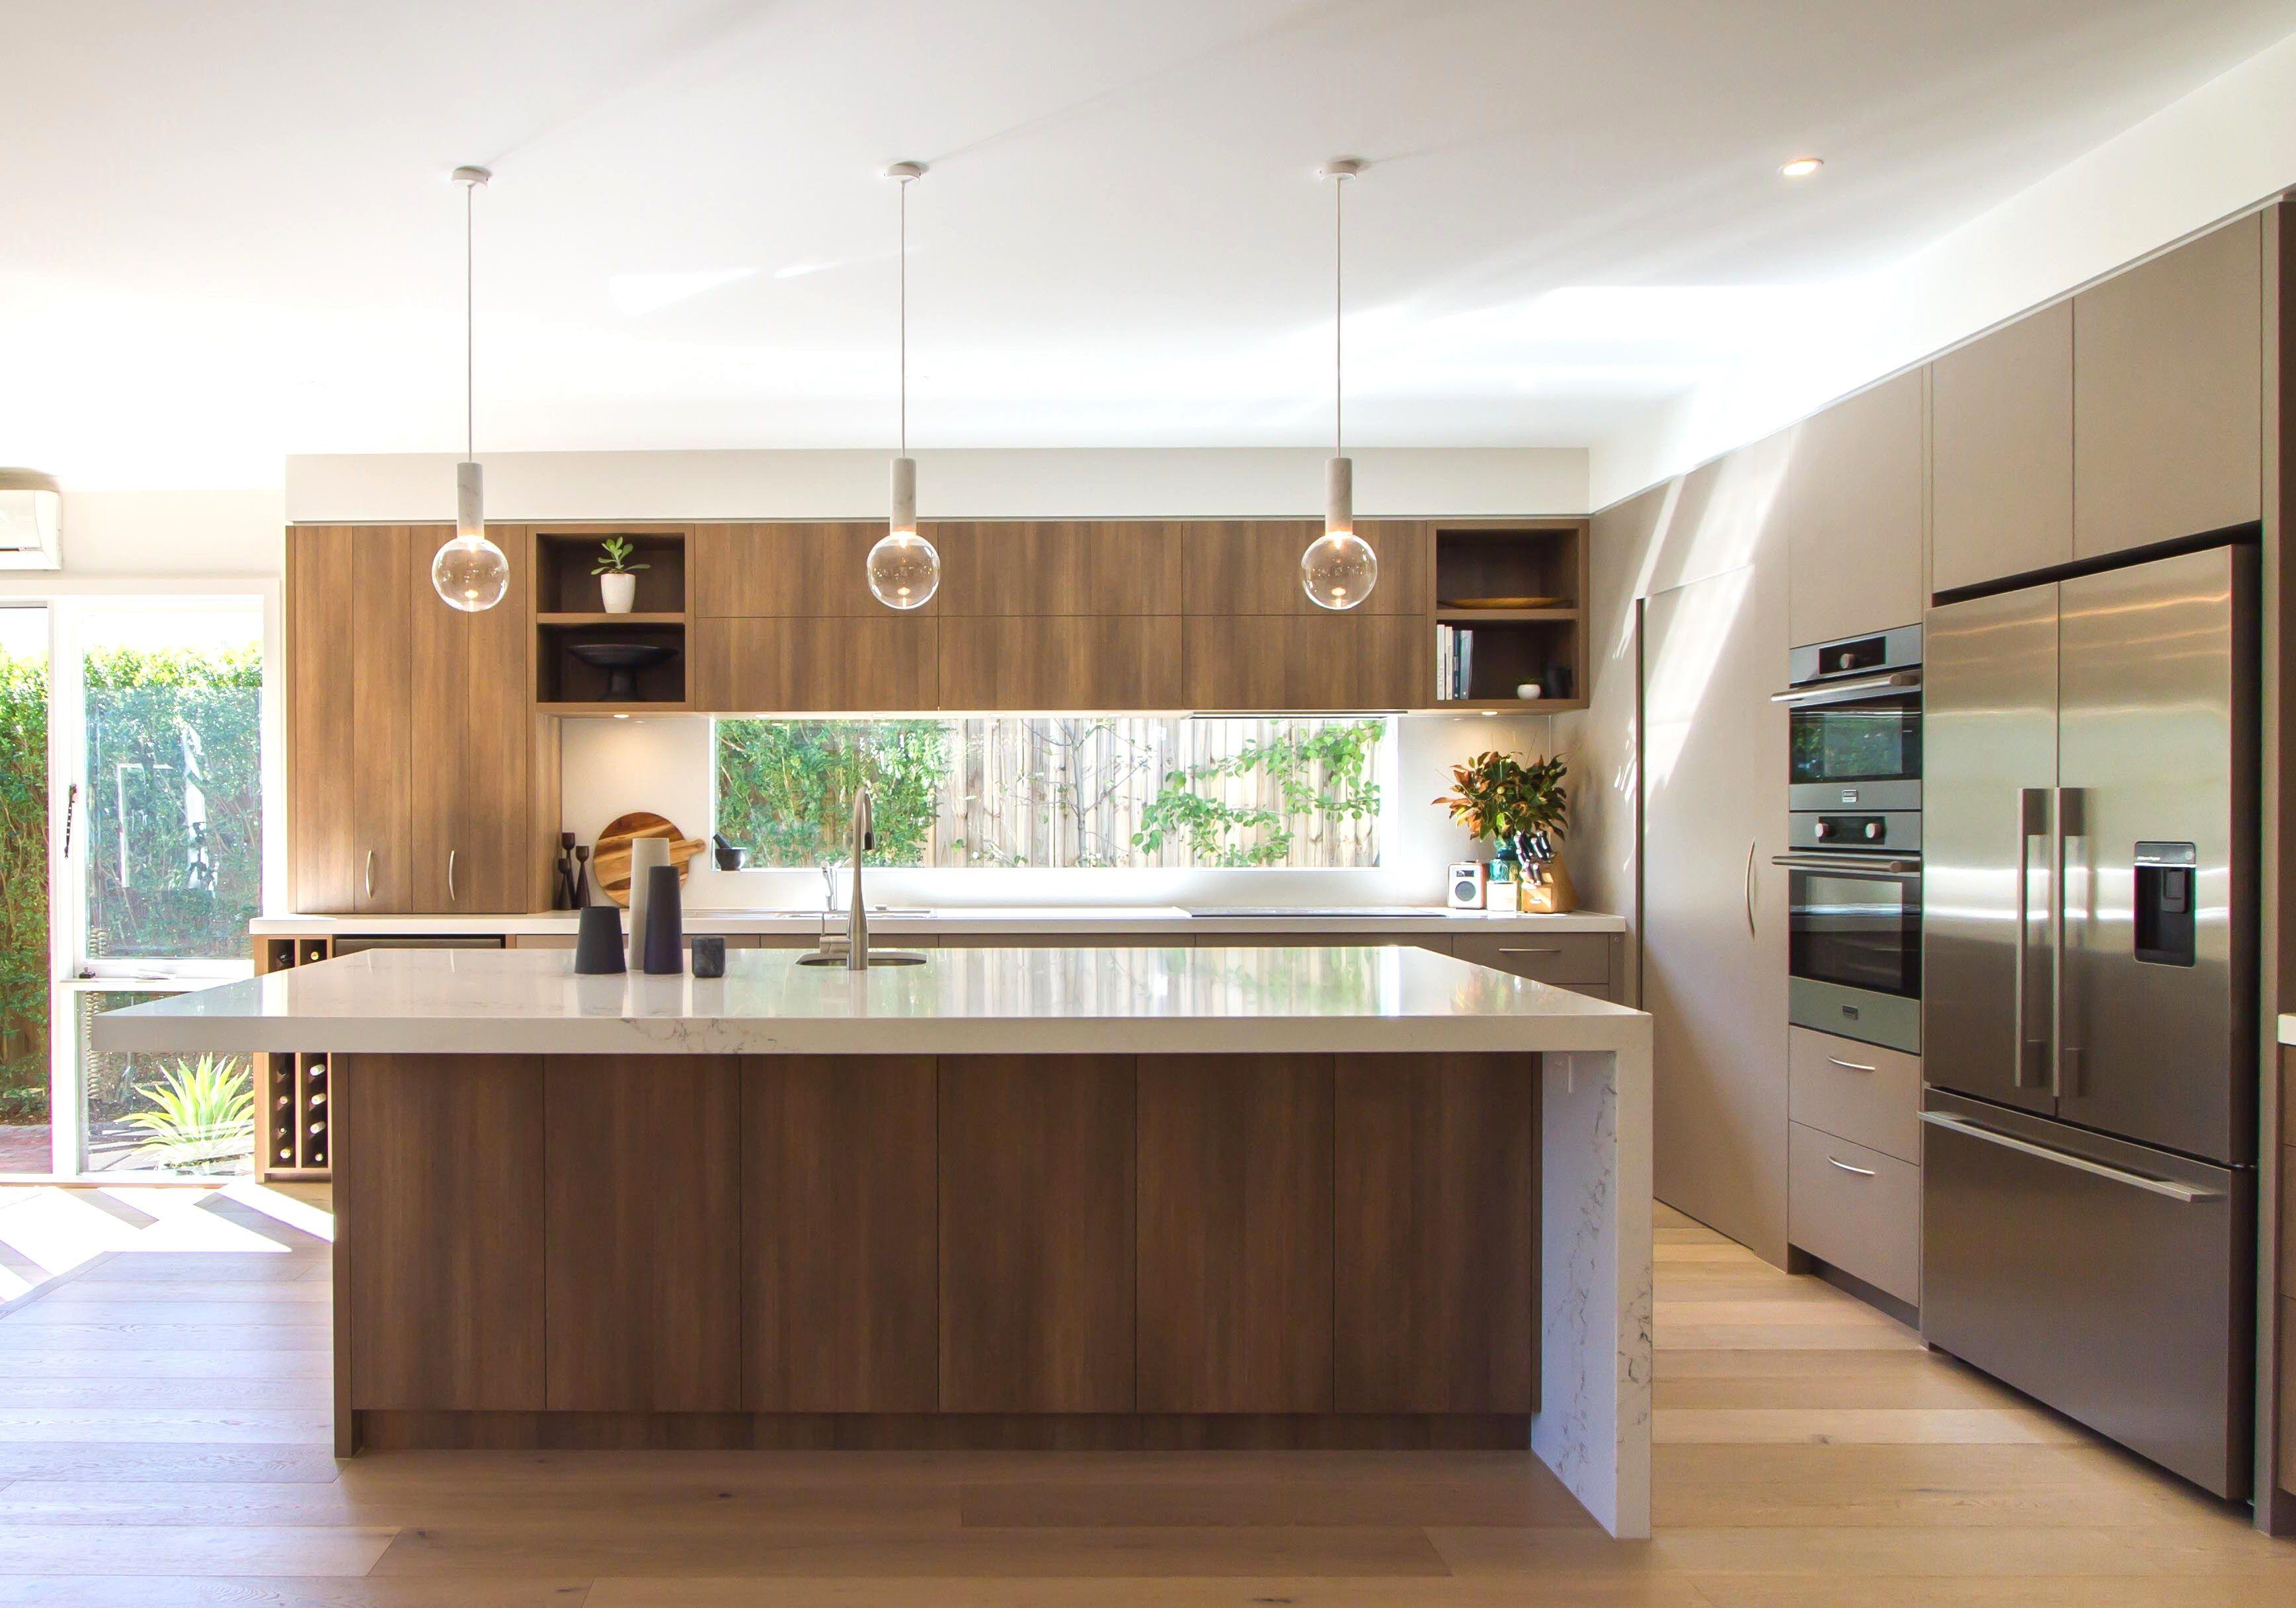 Best Kitchen Gallery: L Shaped Kitchen Designs Ideas For Your Beloved Home Island Bench of Large Modern Kitchen Lights on rachelxblog.com